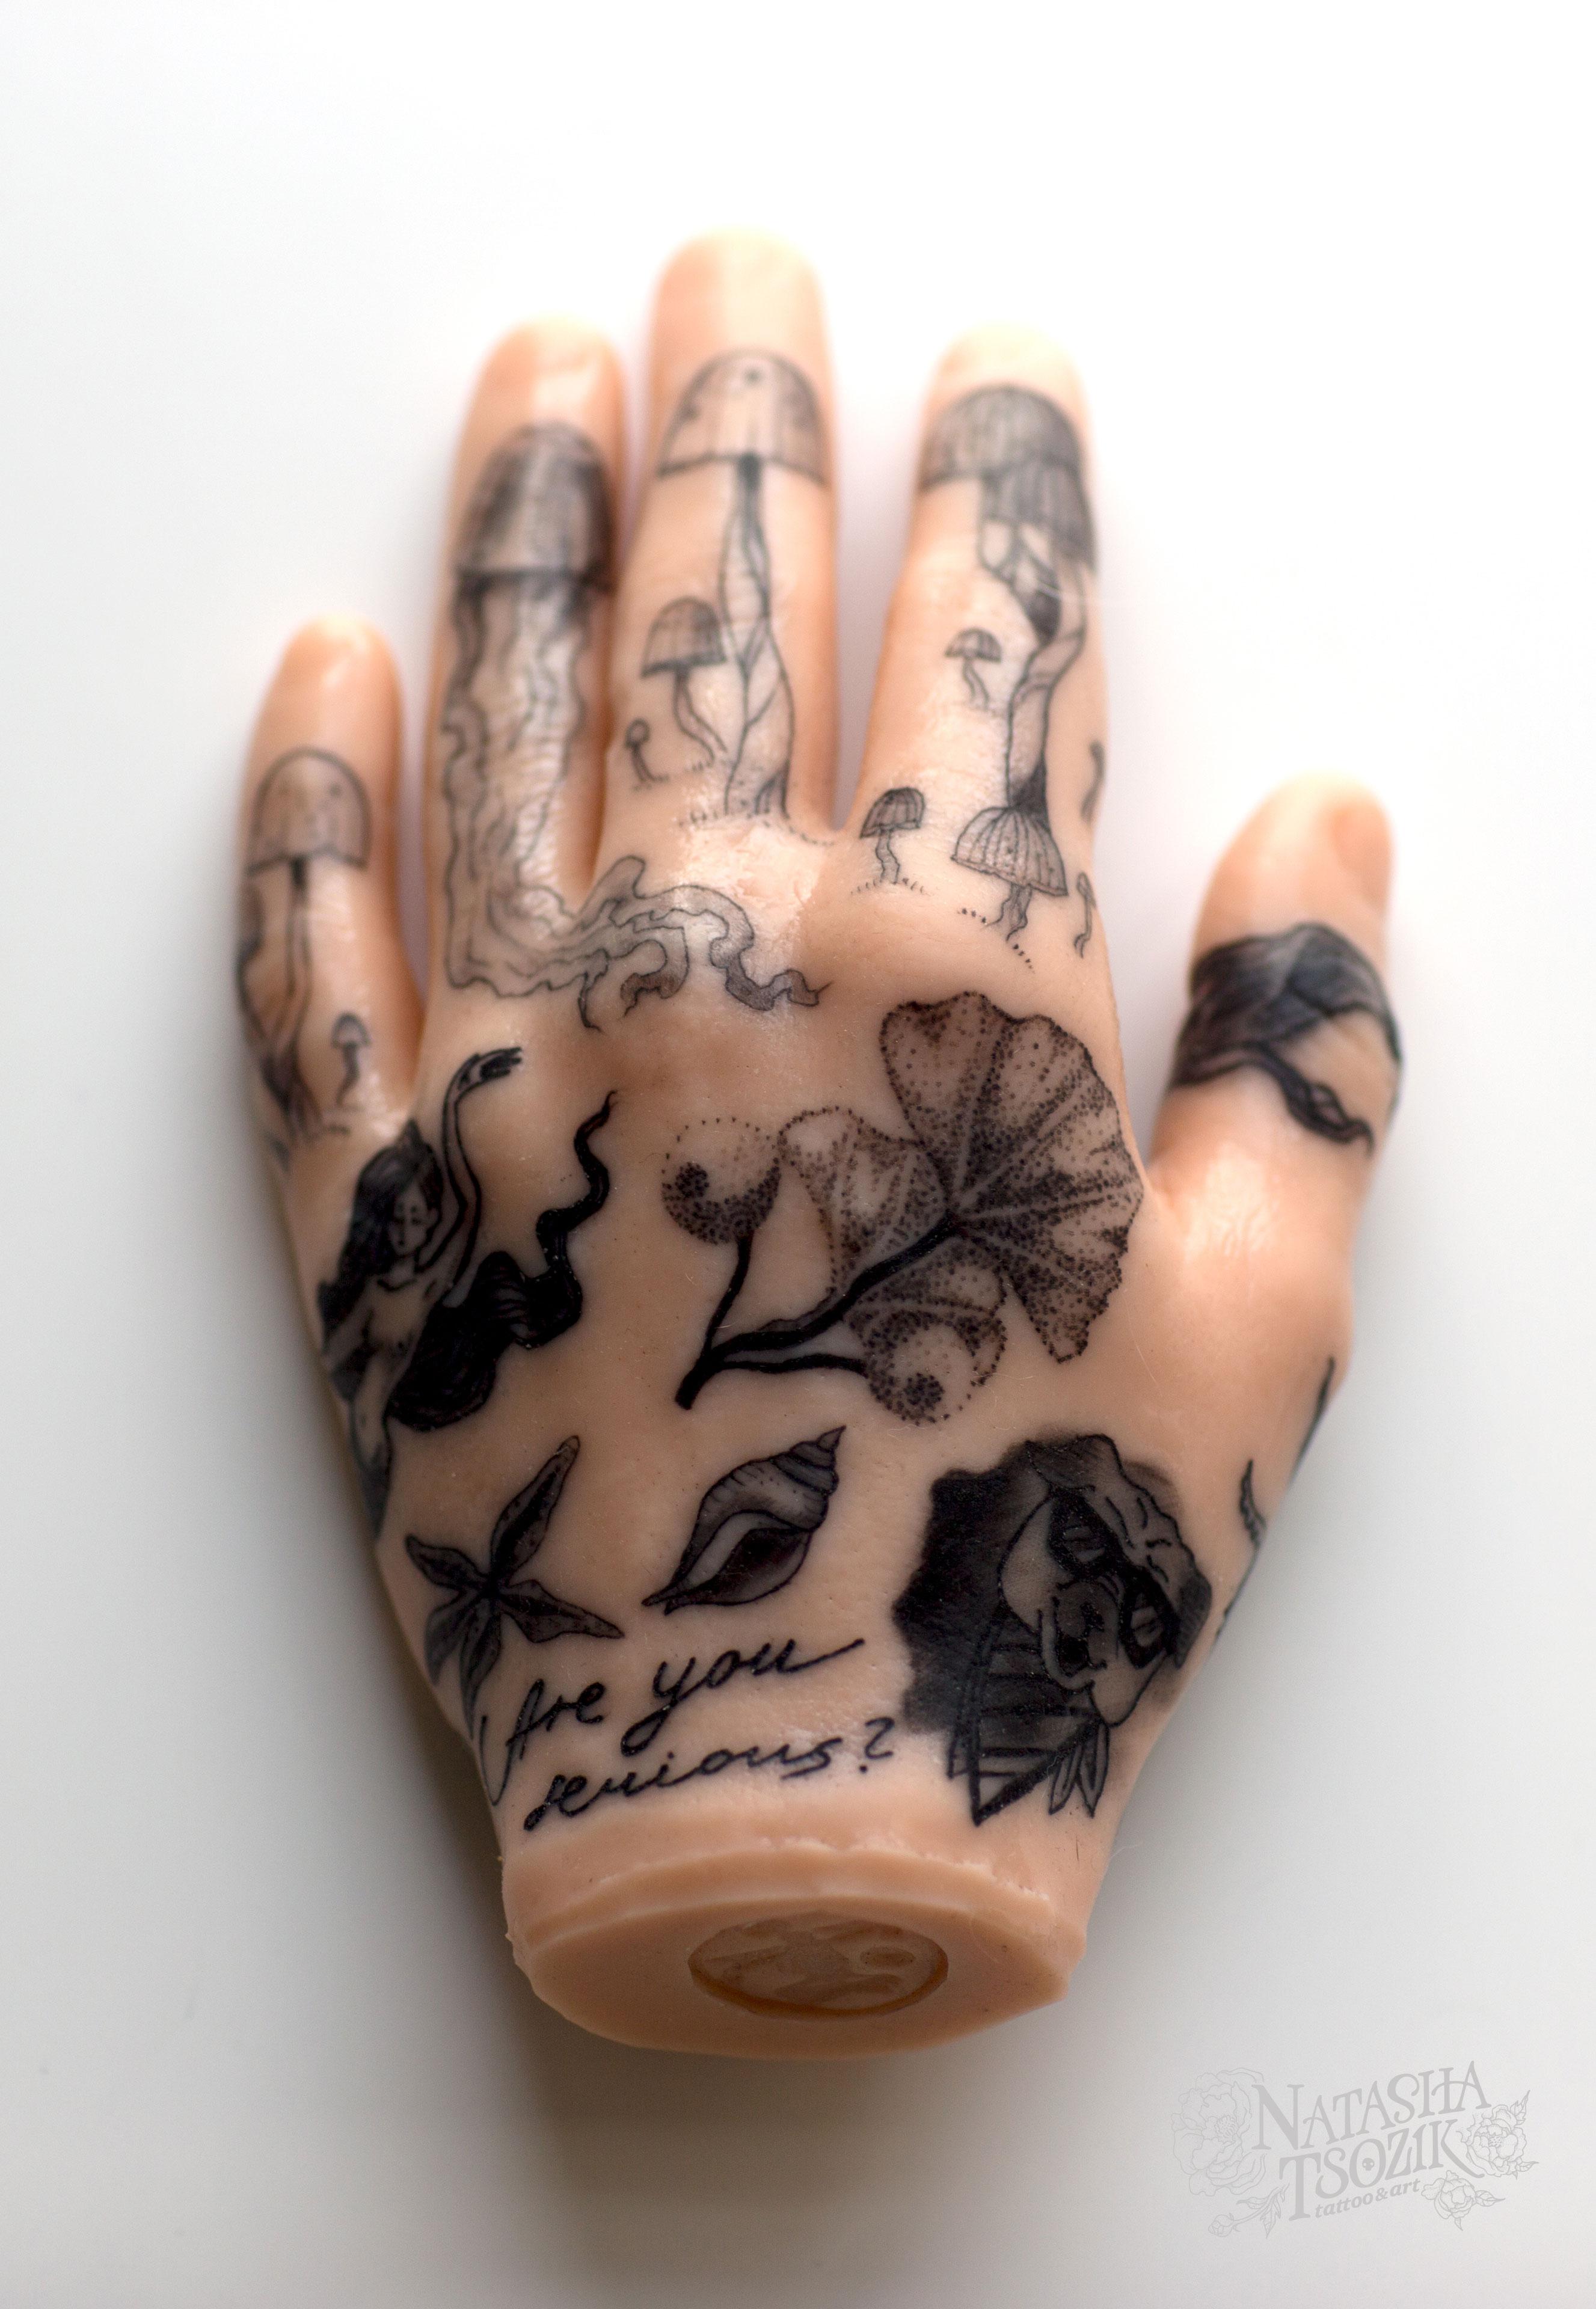 rubber hand2 by Natasha Tsozik